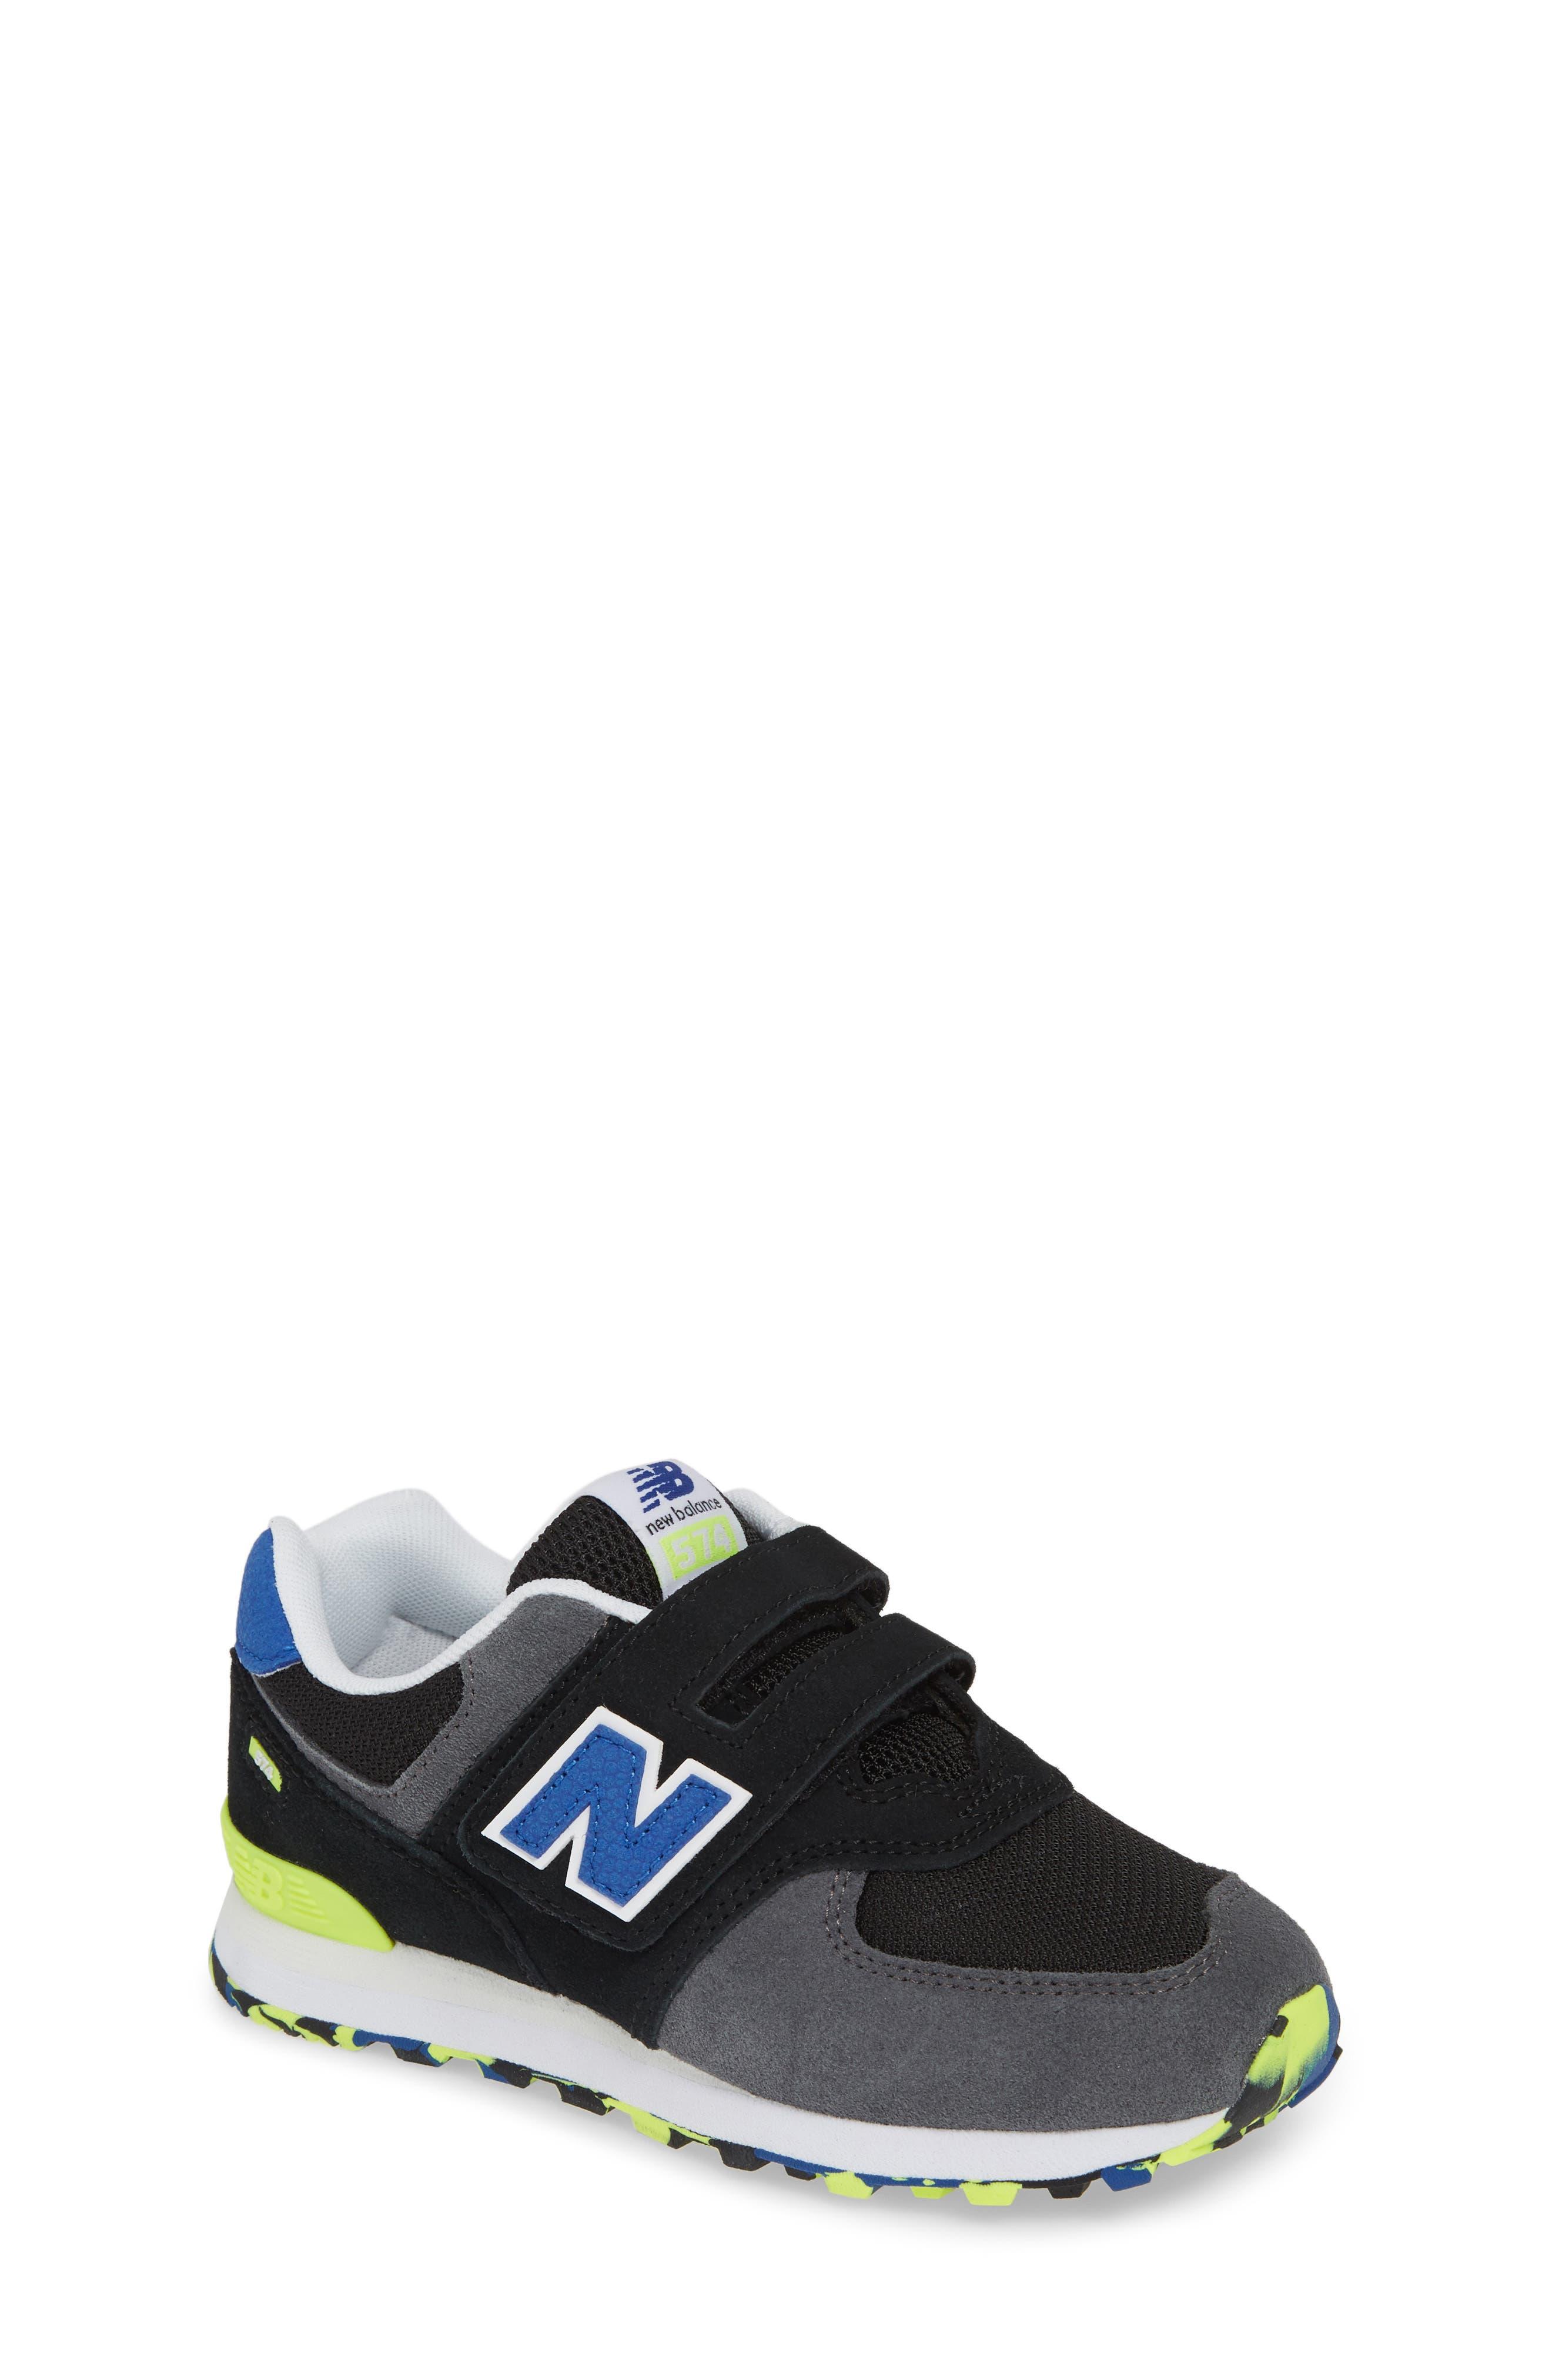 NEW BALANCE 574 Sneaker, Main, color, BLACK/ BLACK